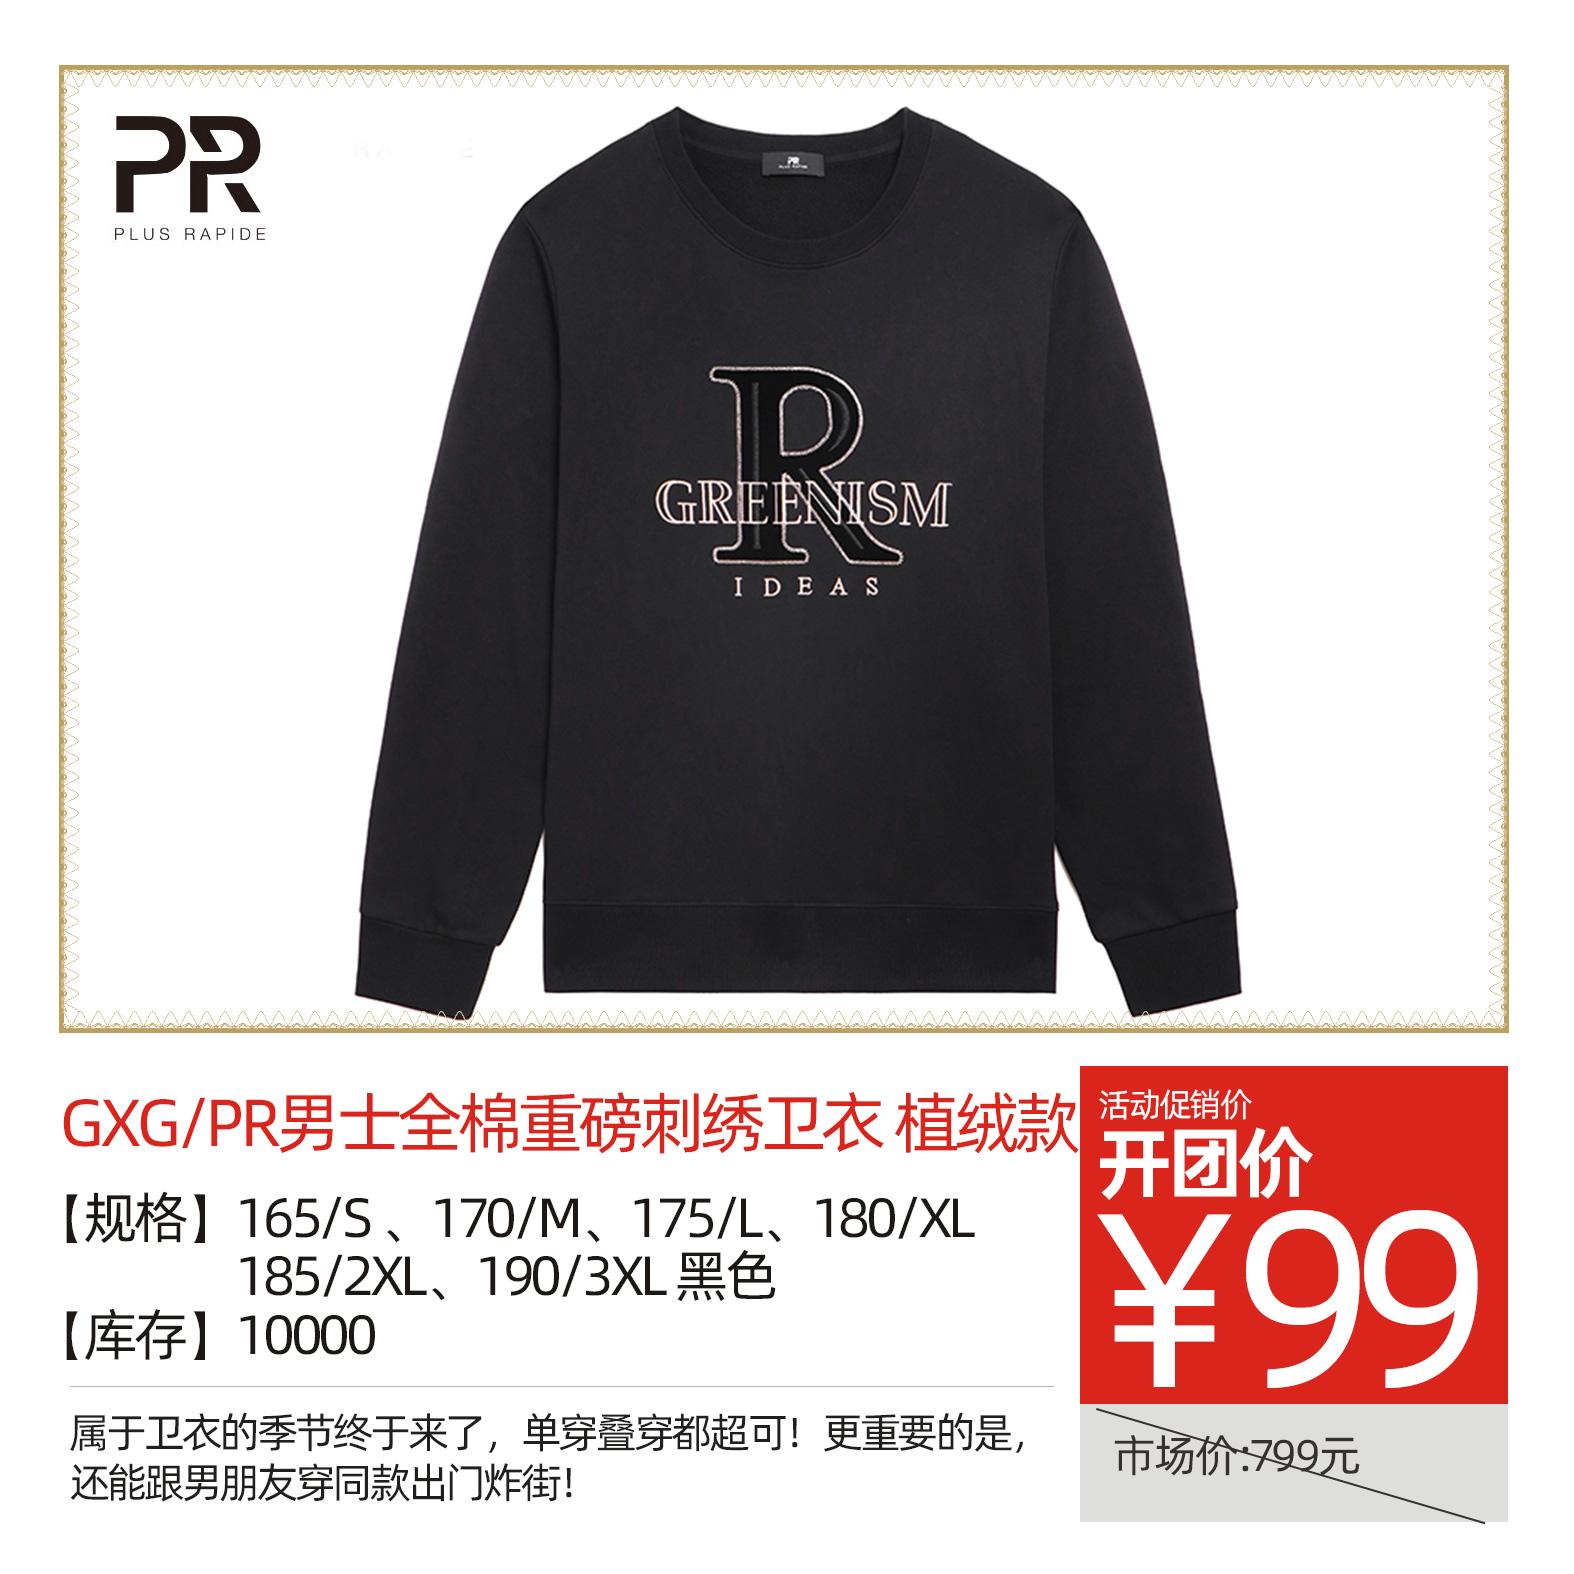 PB131224E GXG/PR男士全棉重磅刺绣卫衣 植绒款